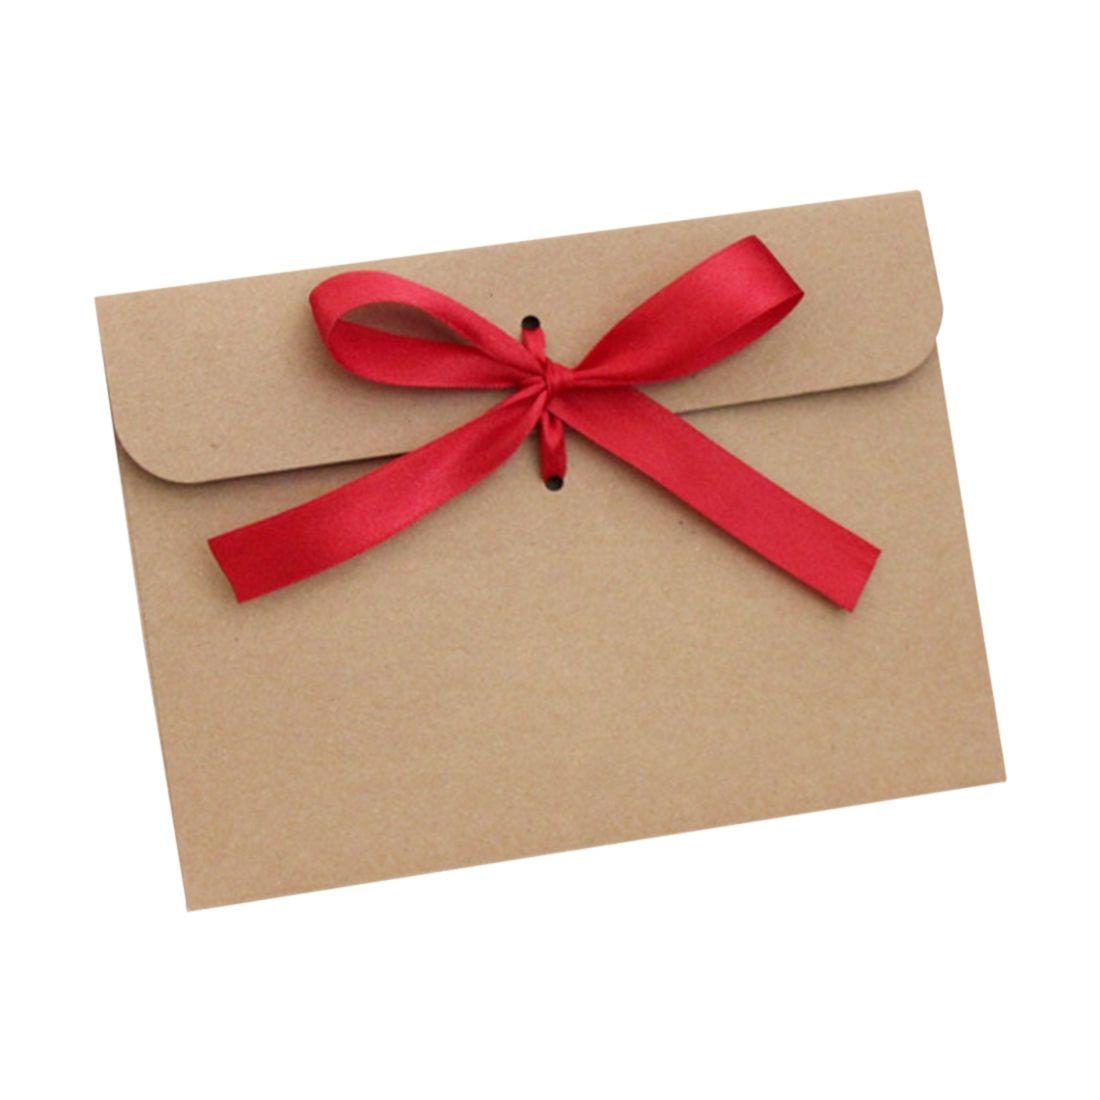 PPYY NEW -12pcs Bow Kraft Envelope